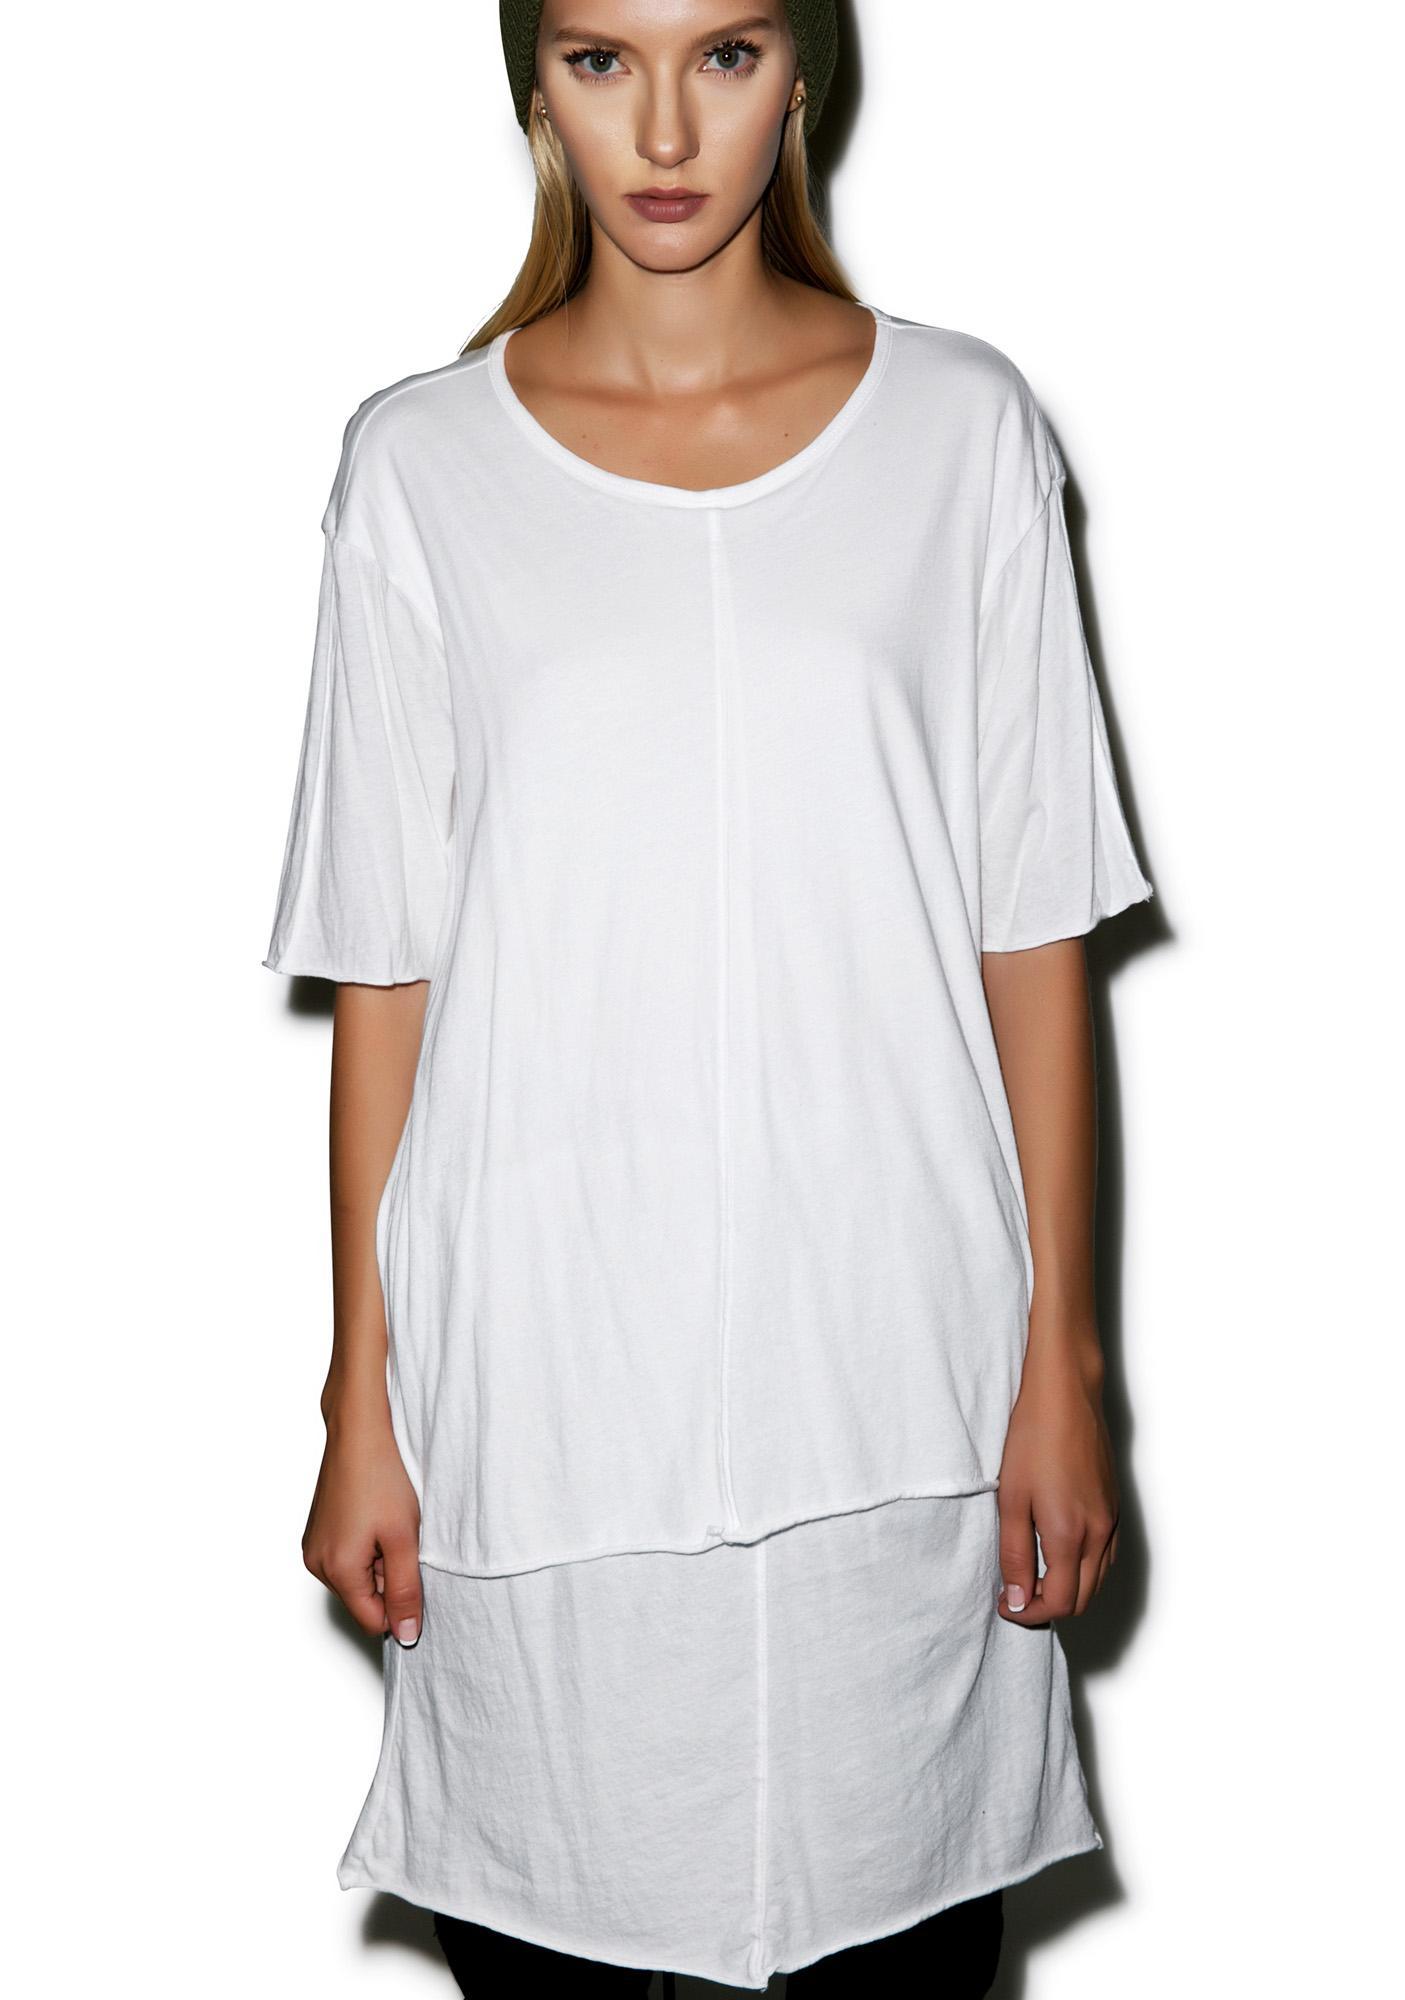 Knomadik Knomad Layered T-Shirt Dress